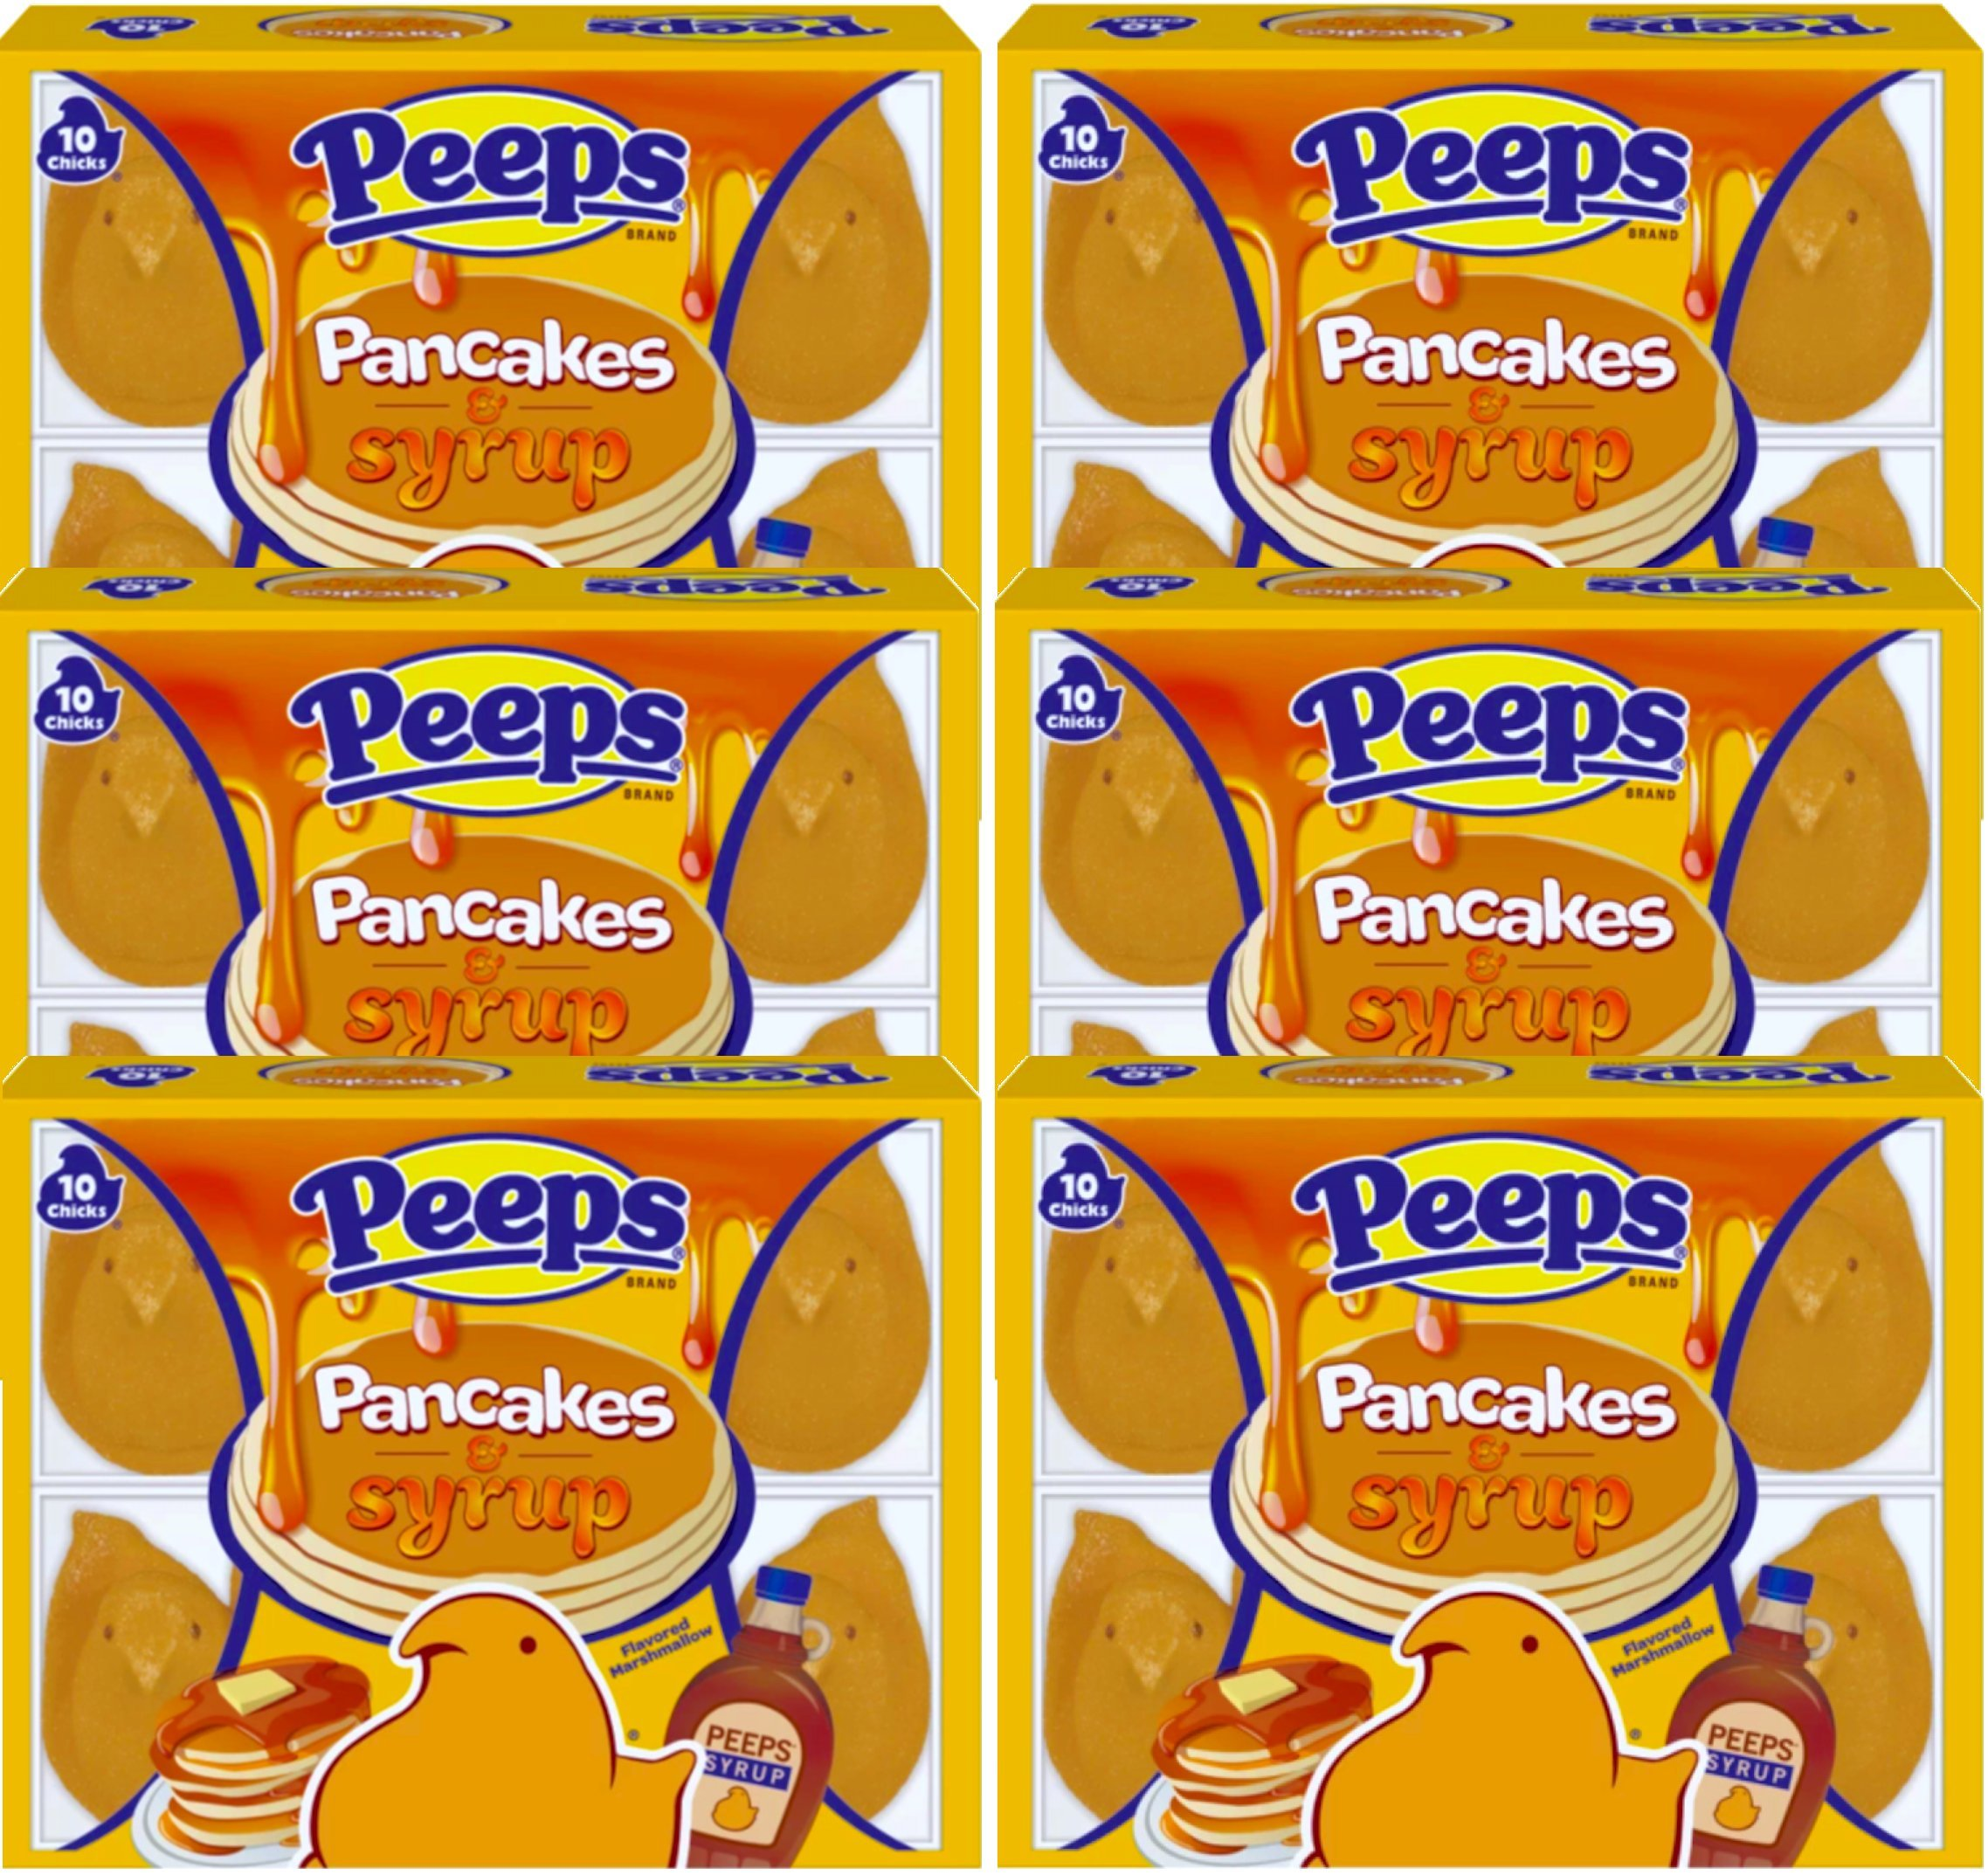 NEW Peeps Pancakes & Syrup Marshmallow Chicks Net Wt 3 Oz (6)